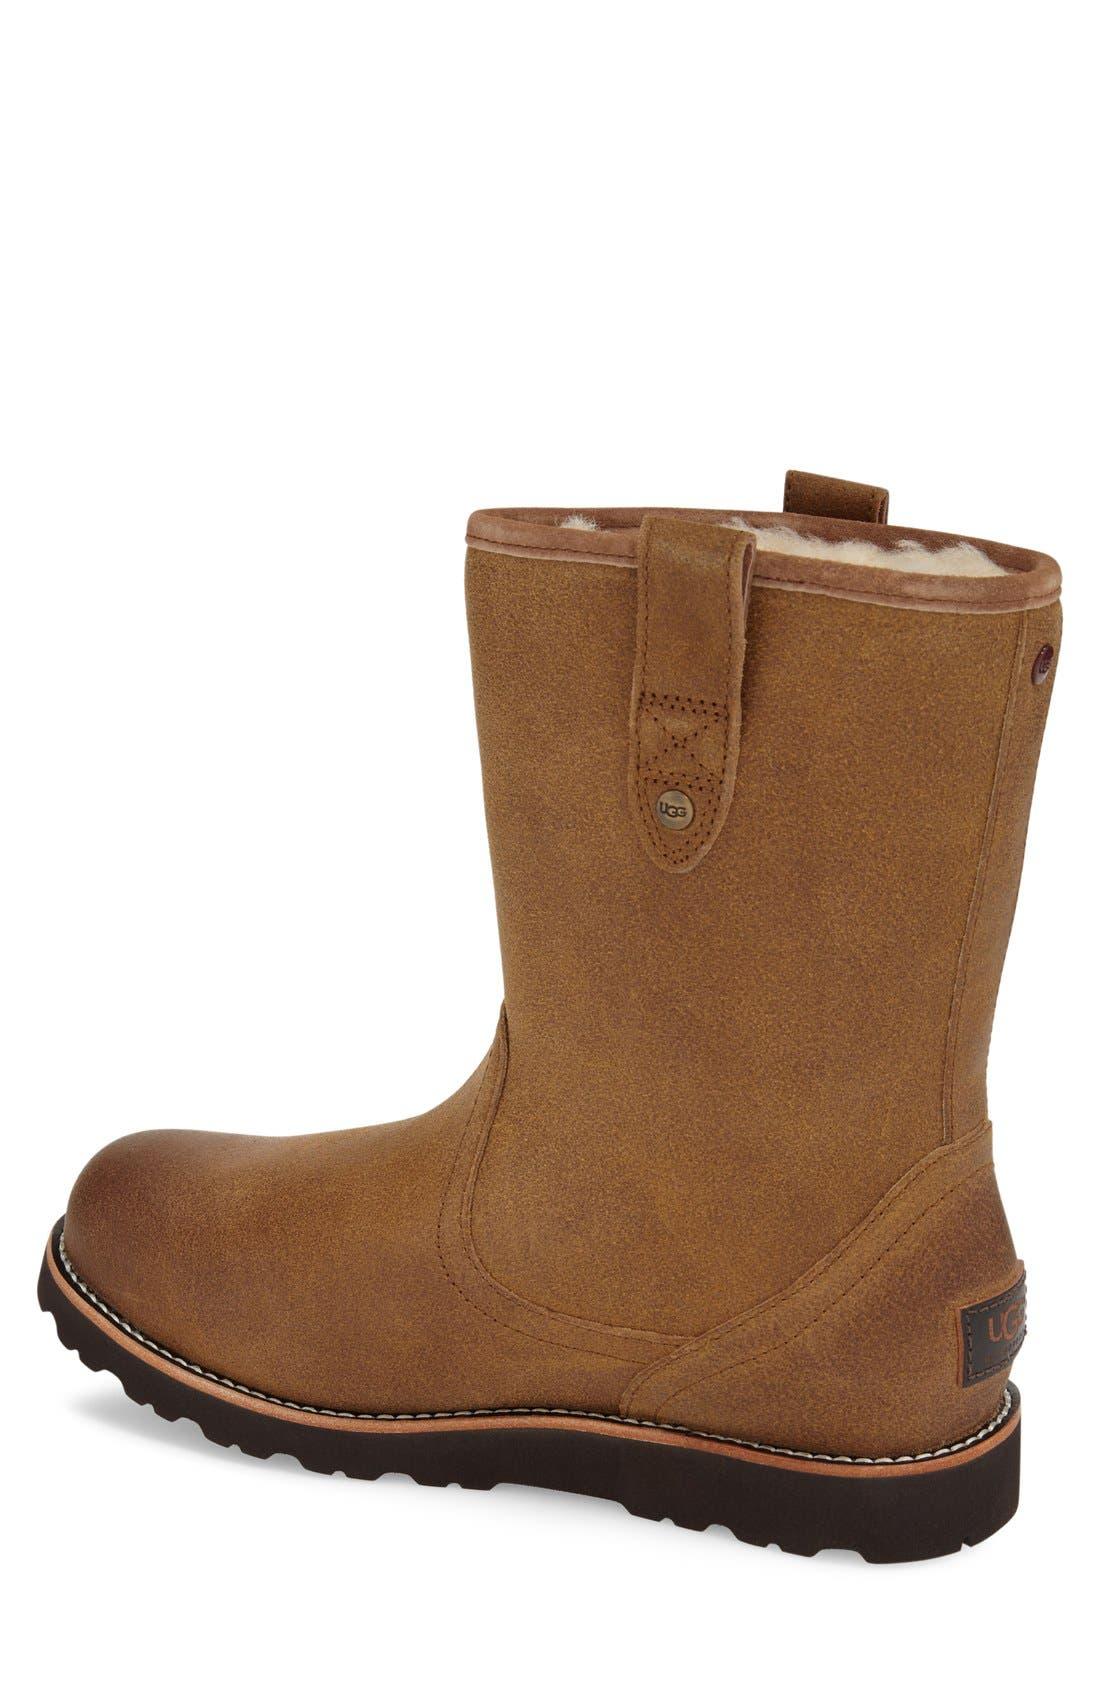 Stoneman Waterproof Boot,                             Alternate thumbnail 2, color,                             219